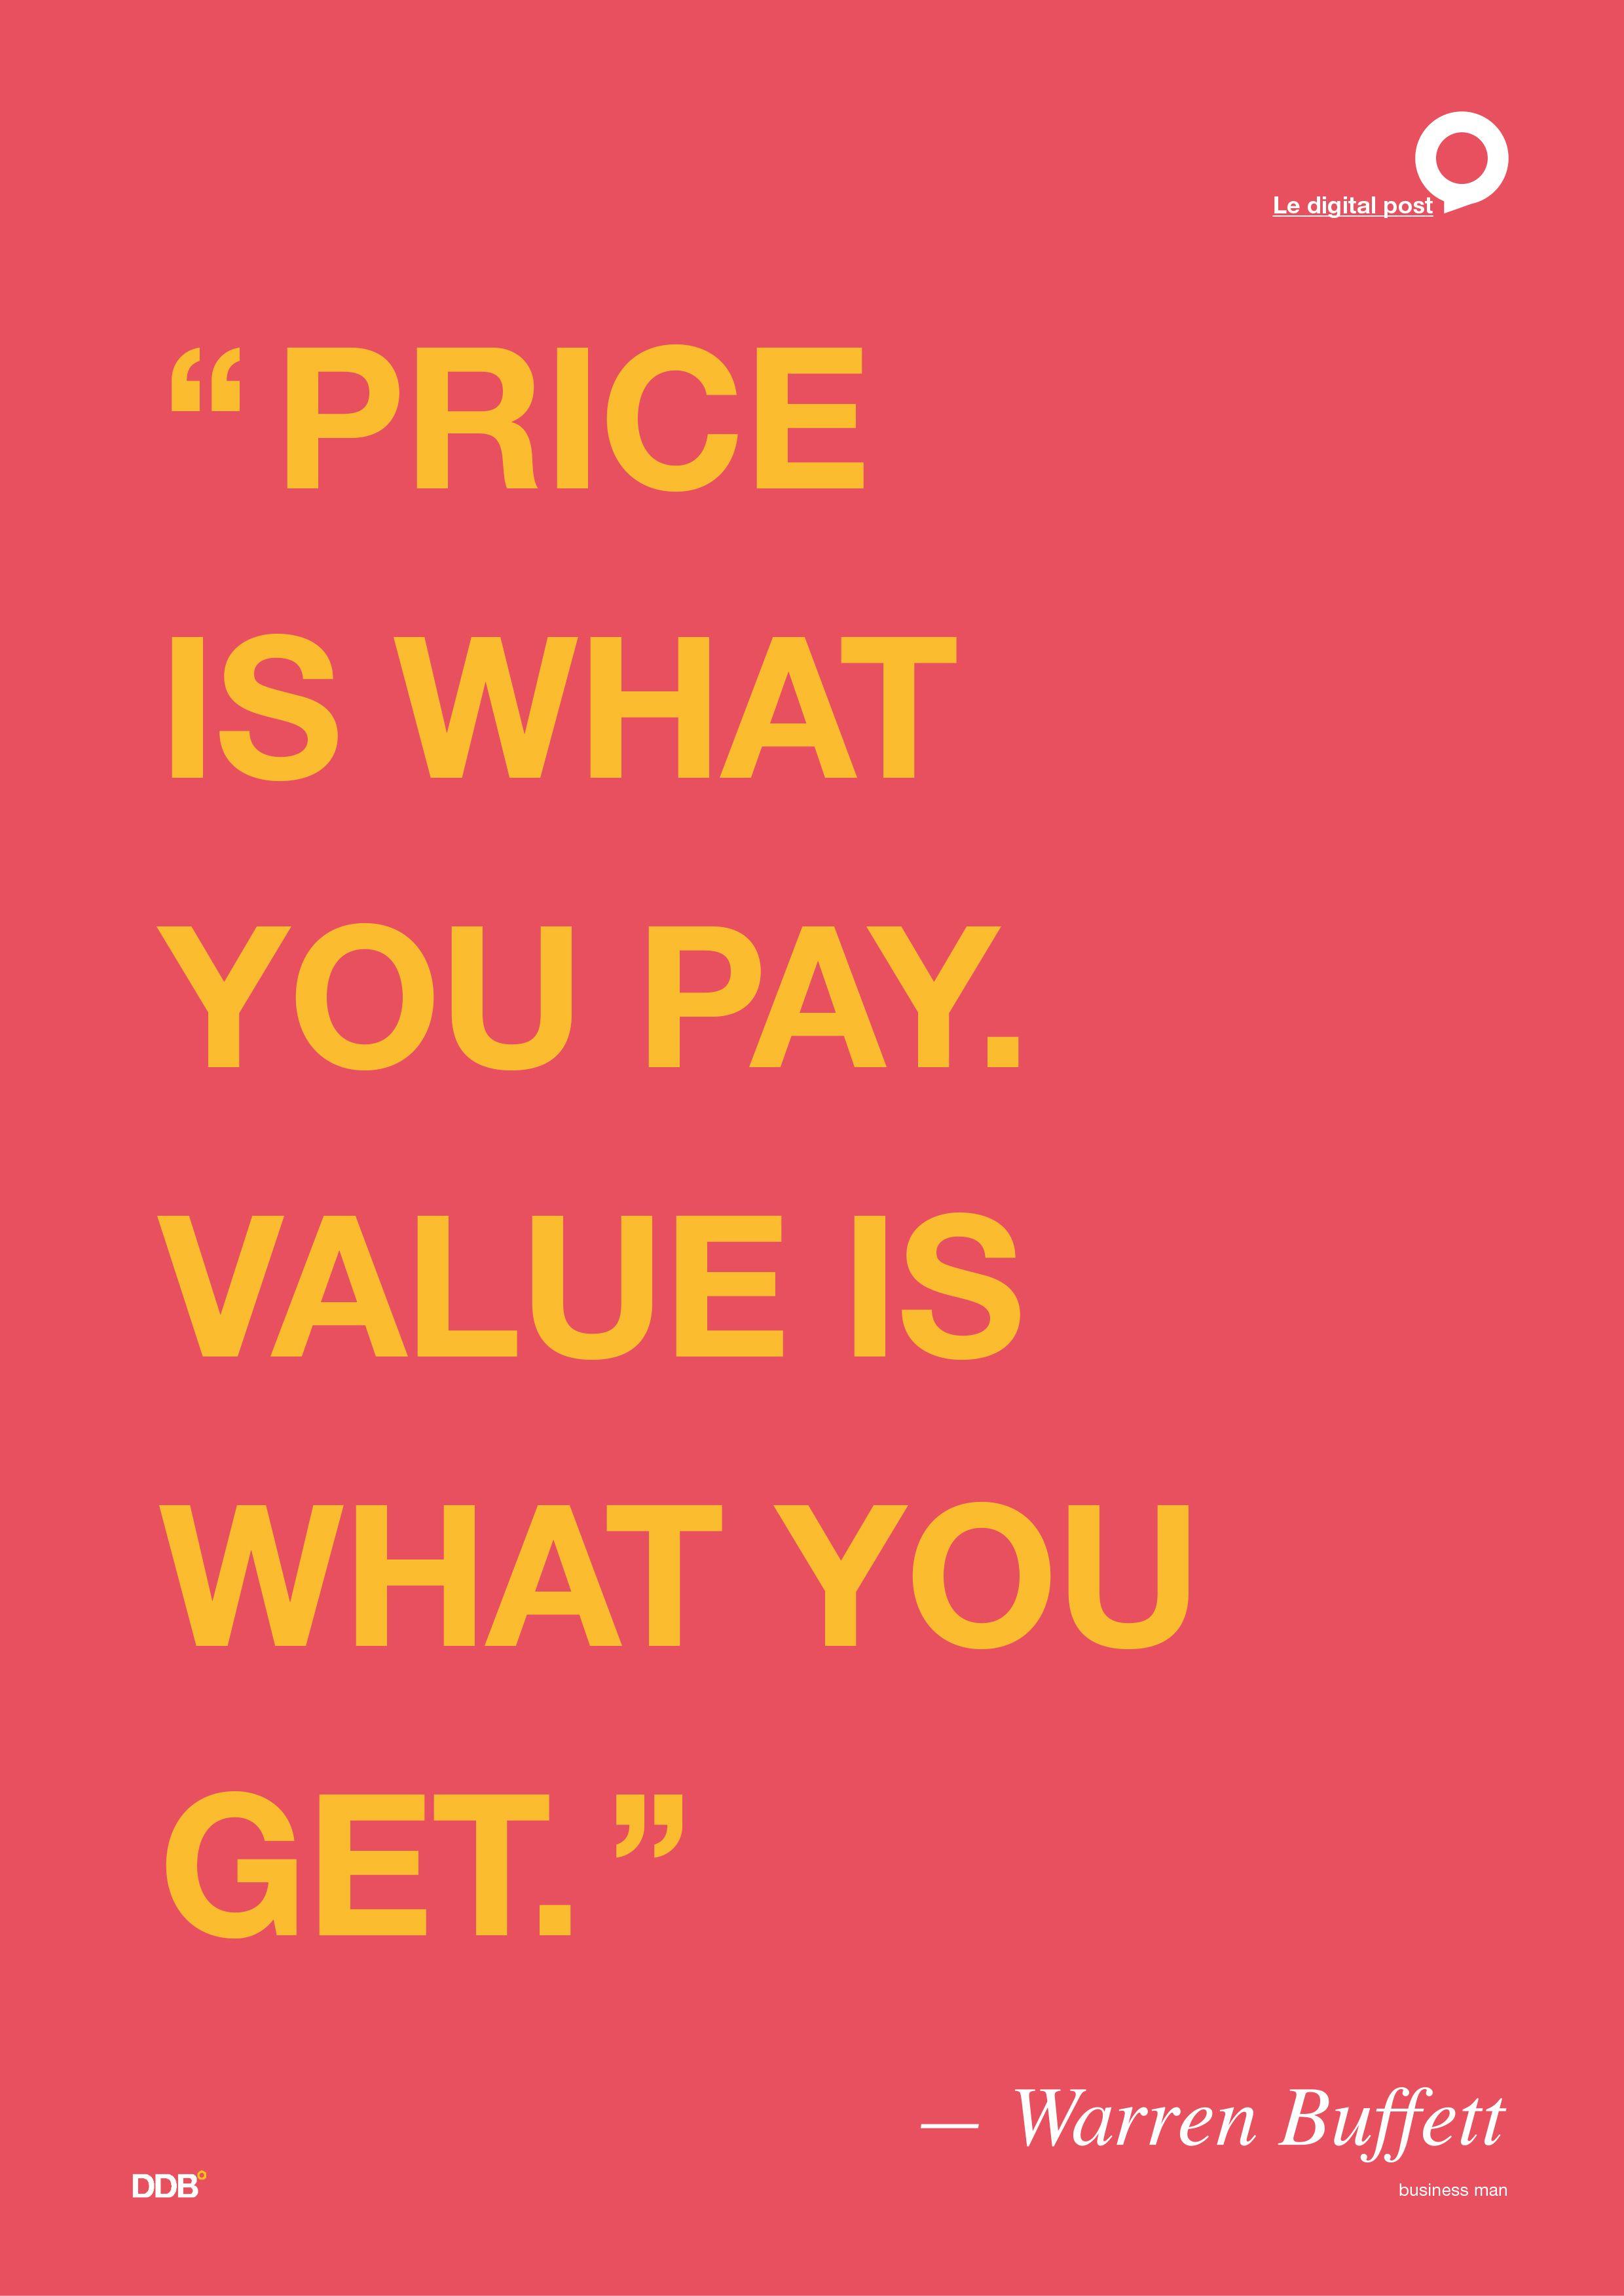 Warren Buffet Businessman Business Inspiration Quotes Entrepreneurship Quotes Inspirational Words